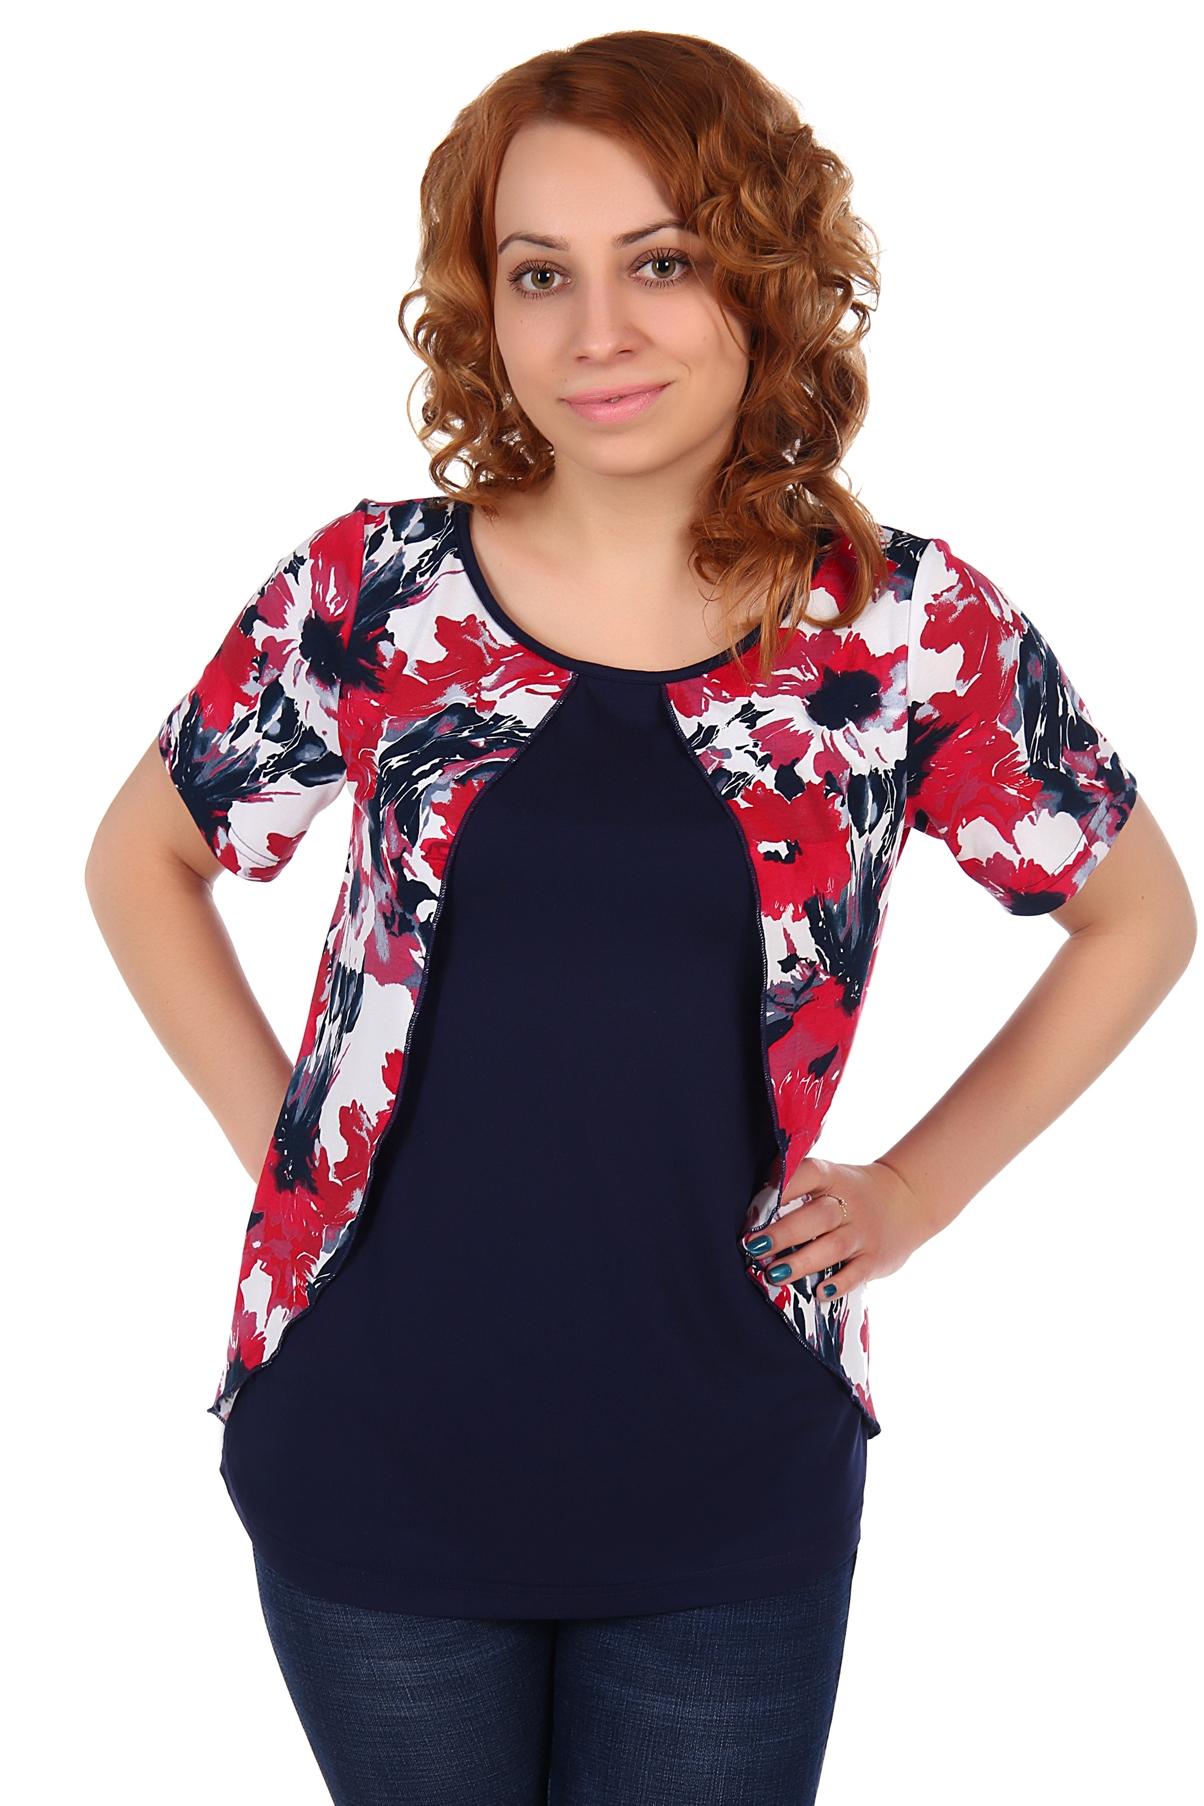 Жен. блуза арт. 16-0105 Красный р. 56Блузы<br>Факт. ОГ: 108 см <br>Факт. ОТ: 108 см <br>Факт. ОБ: 116 см <br>Длина по спинке: 66 см<br><br>Тип: Жен. блуза<br>Размер: 56<br>Материал: Вискоза